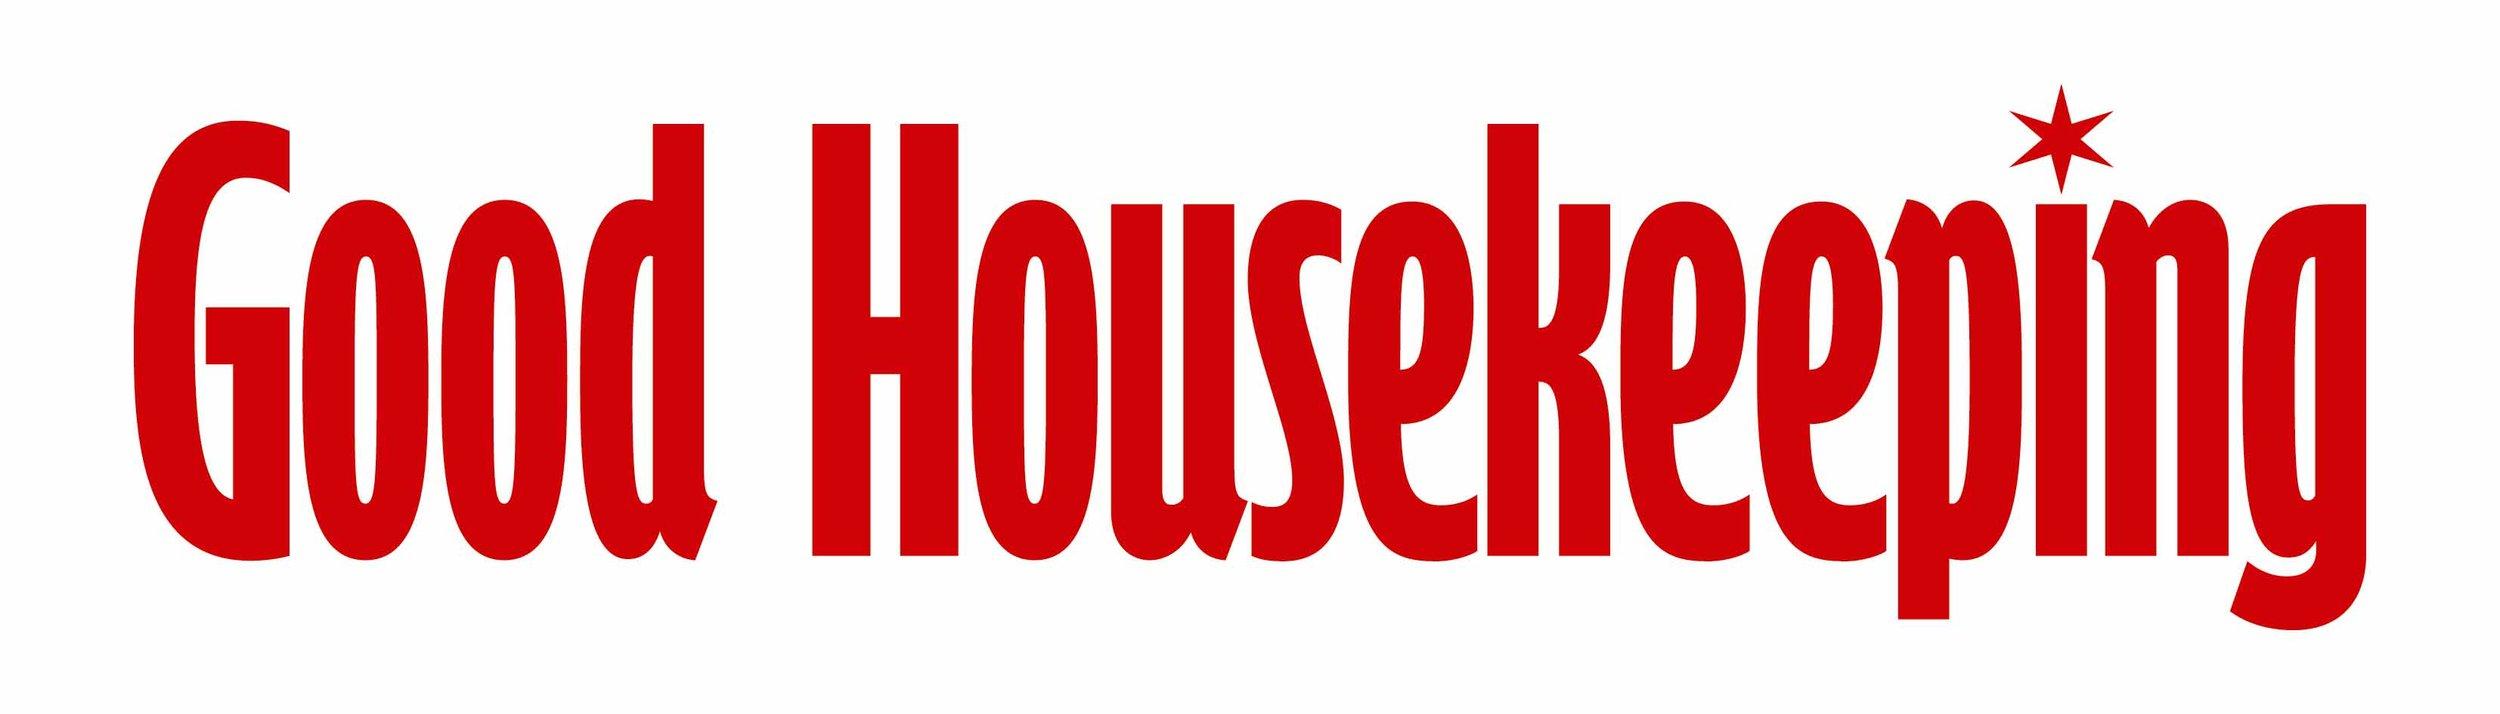 GH_logo-2.jpg